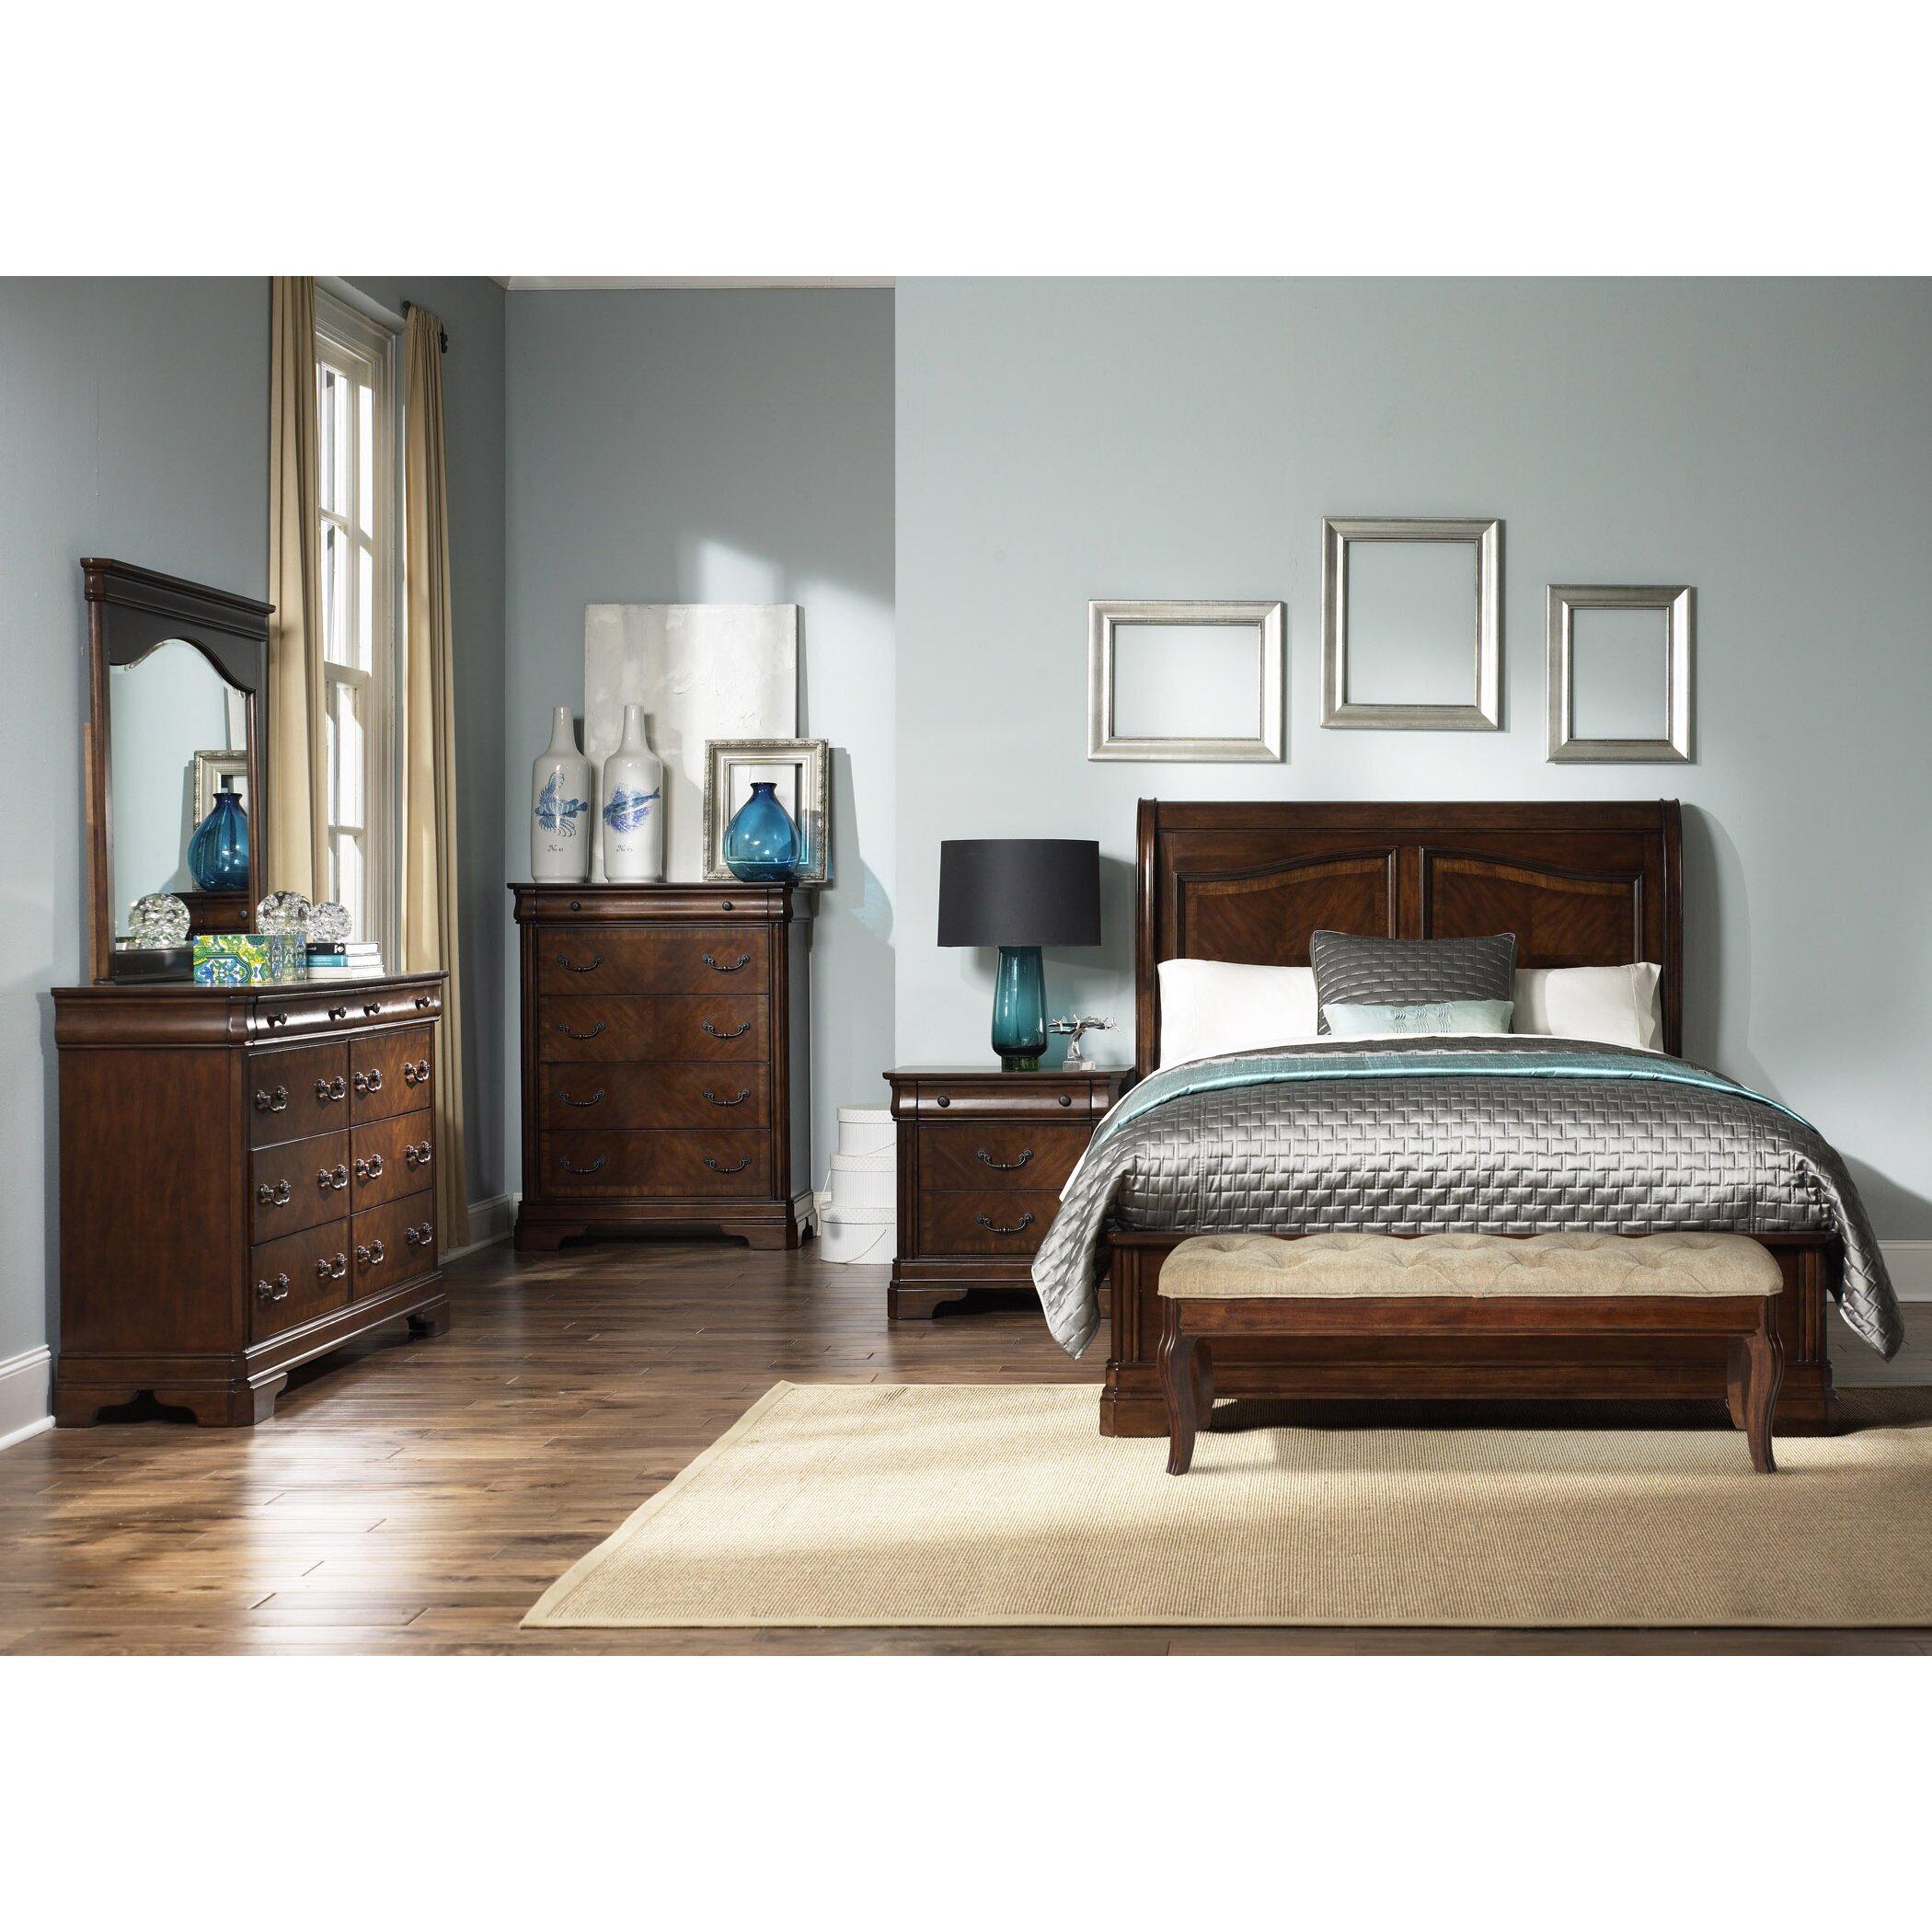 Rosalind Wheeler Ruppert Upholstered Bedroom Bench